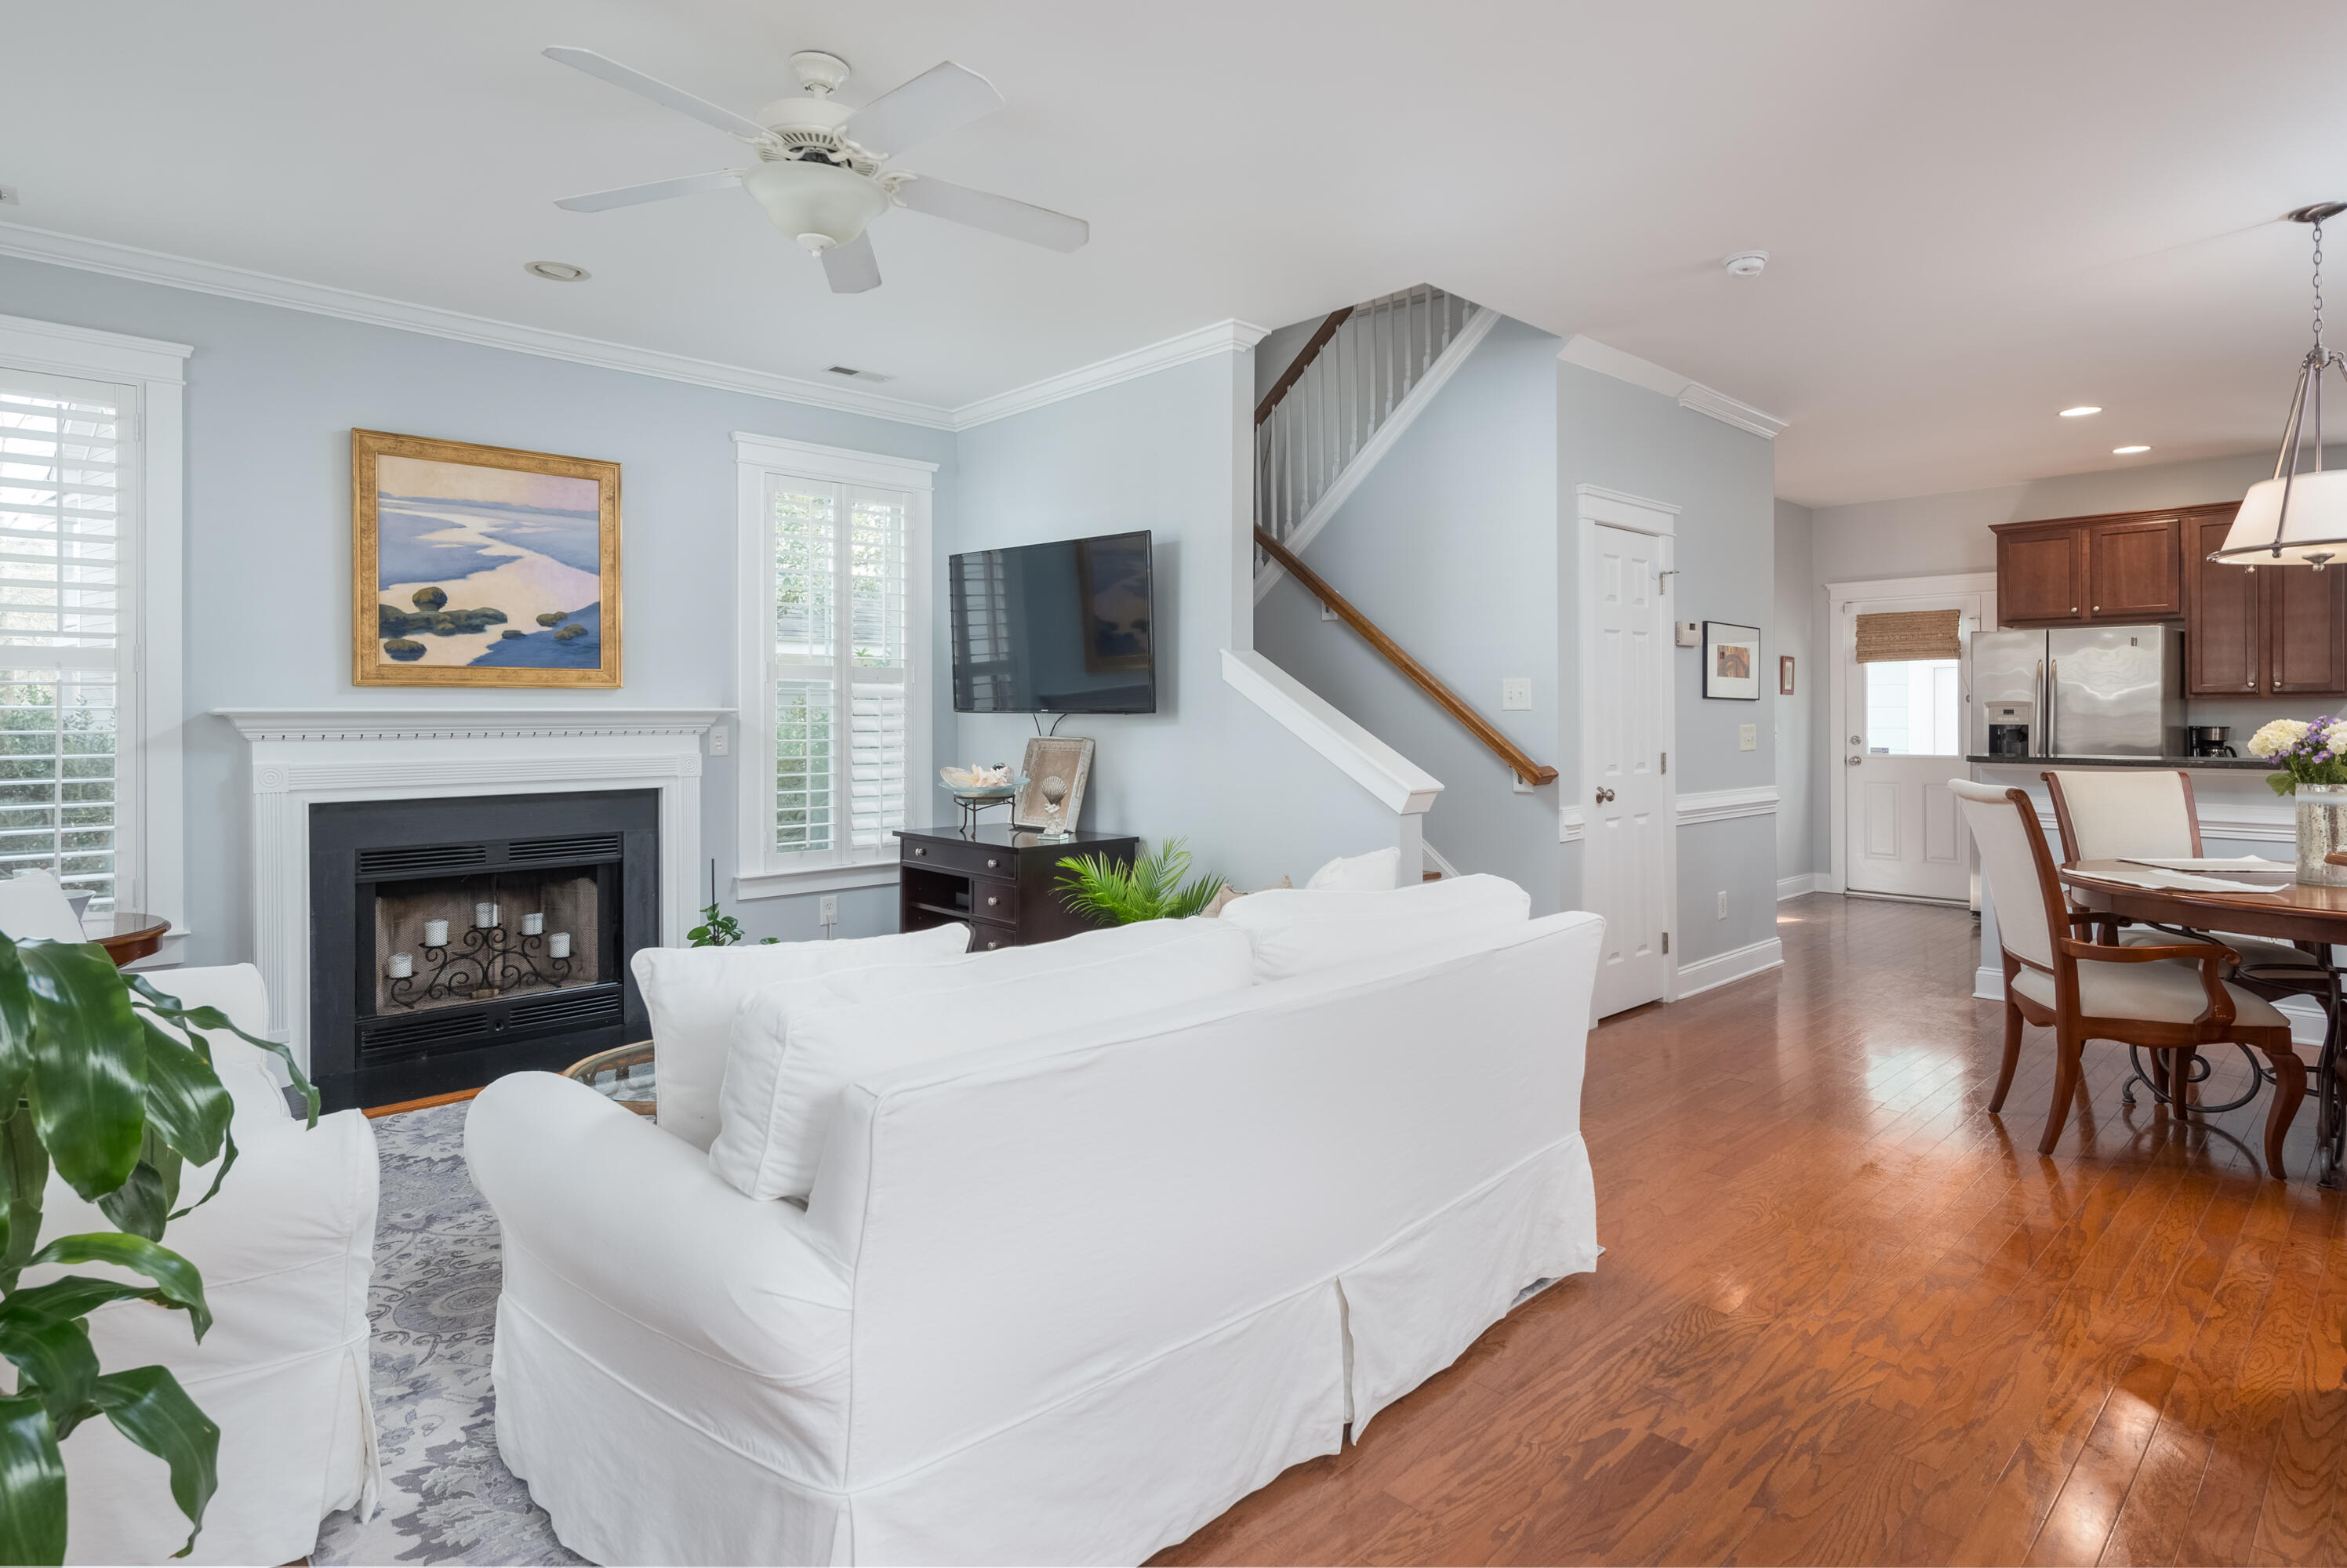 Carol Oaks Homes For Sale - 2813 Caitlins, Mount Pleasant, SC - 12